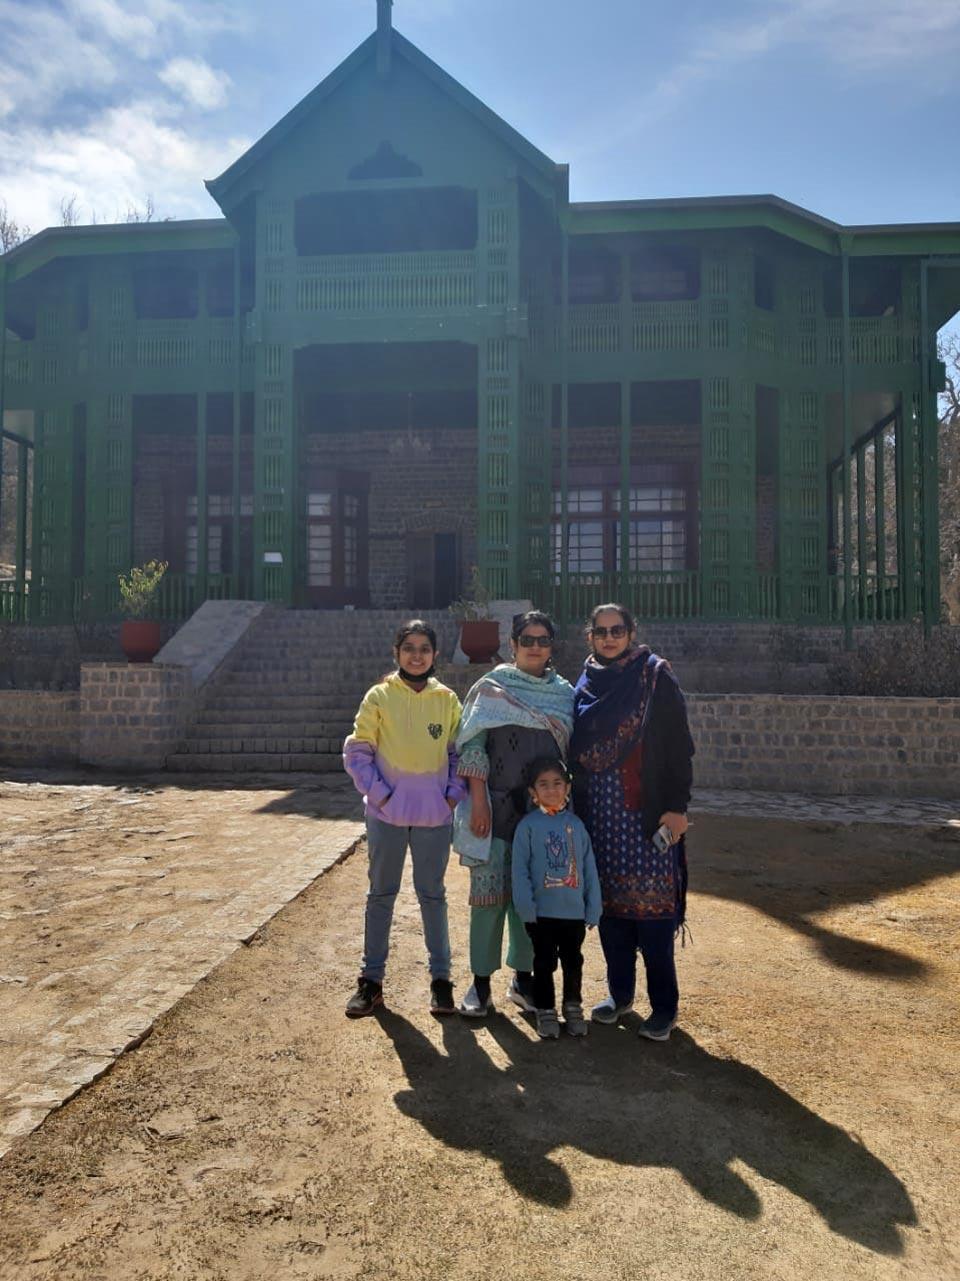 Zara, Farhat, Ayesha and Erum in front of Quaid-e-Azam residency in Ziarat.